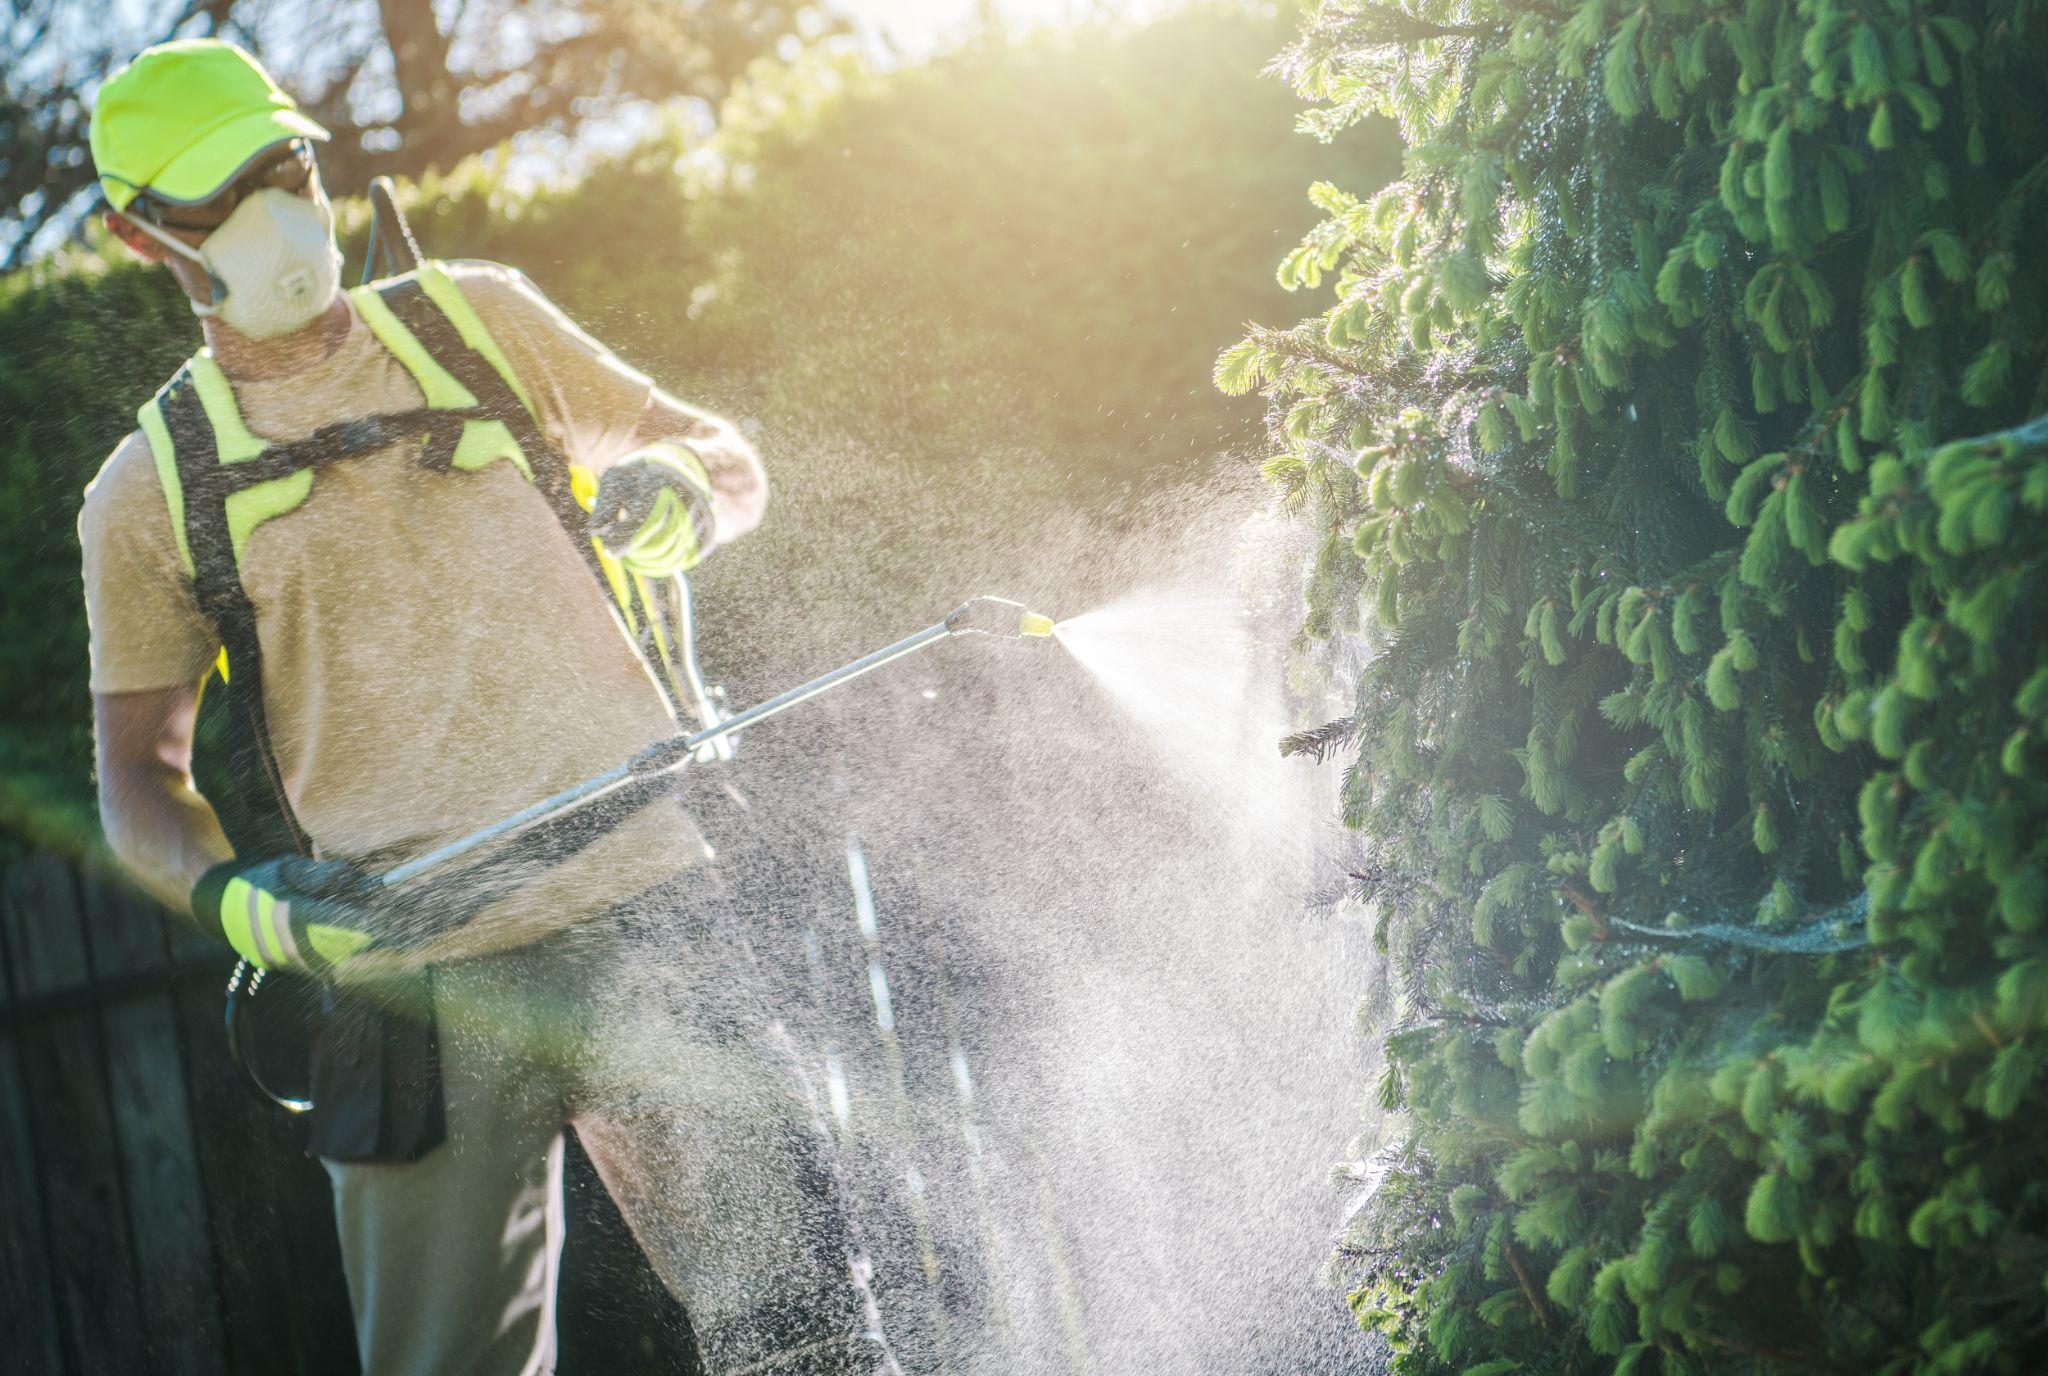 A landscape contractor applying pesticide to a garden bush